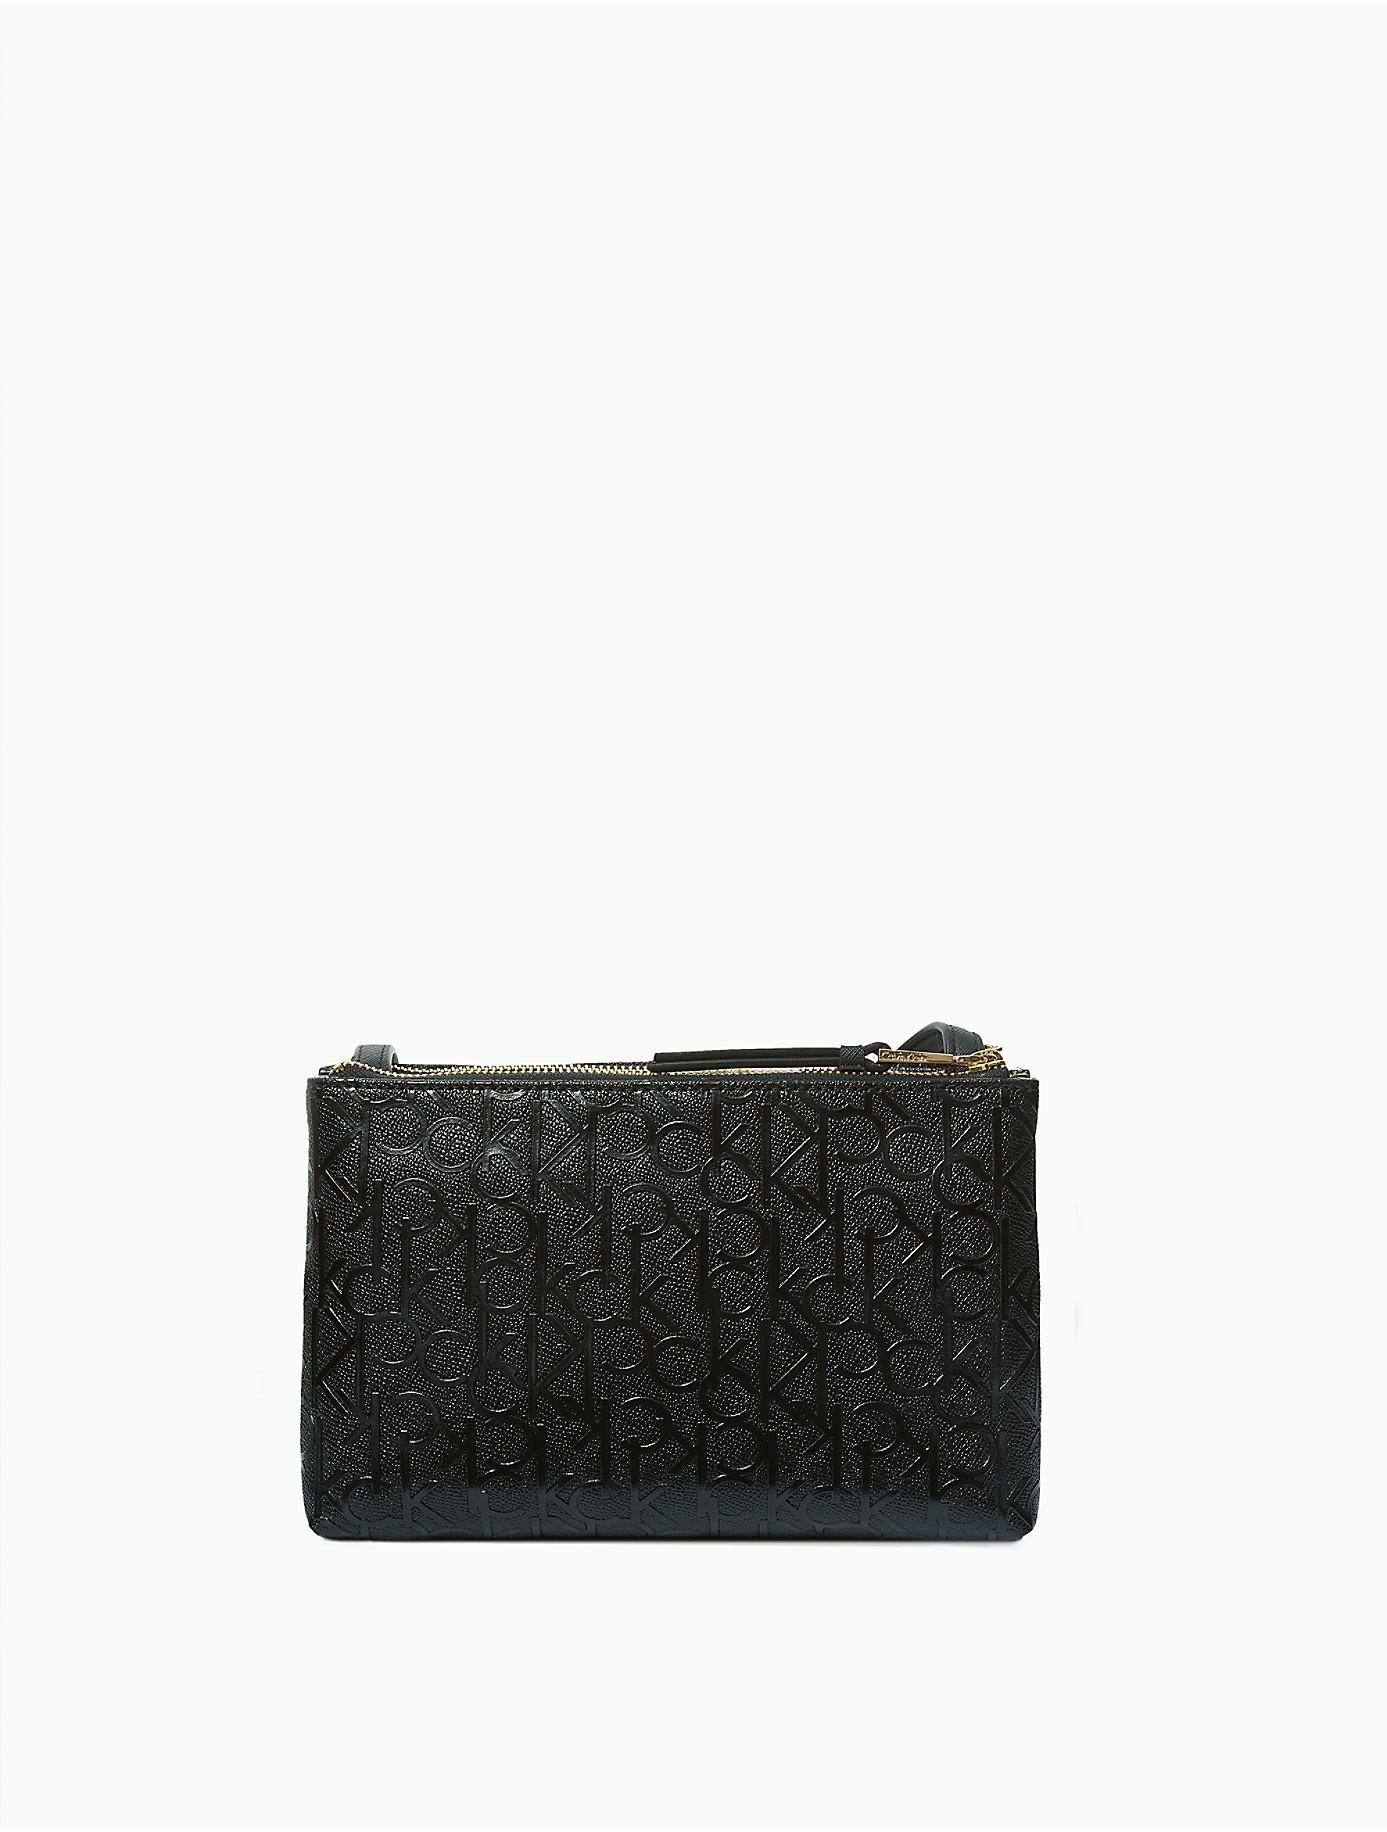 Sac À Bandoulière En Relief - Noir Calvin Klein 205w39nyc xSYcy